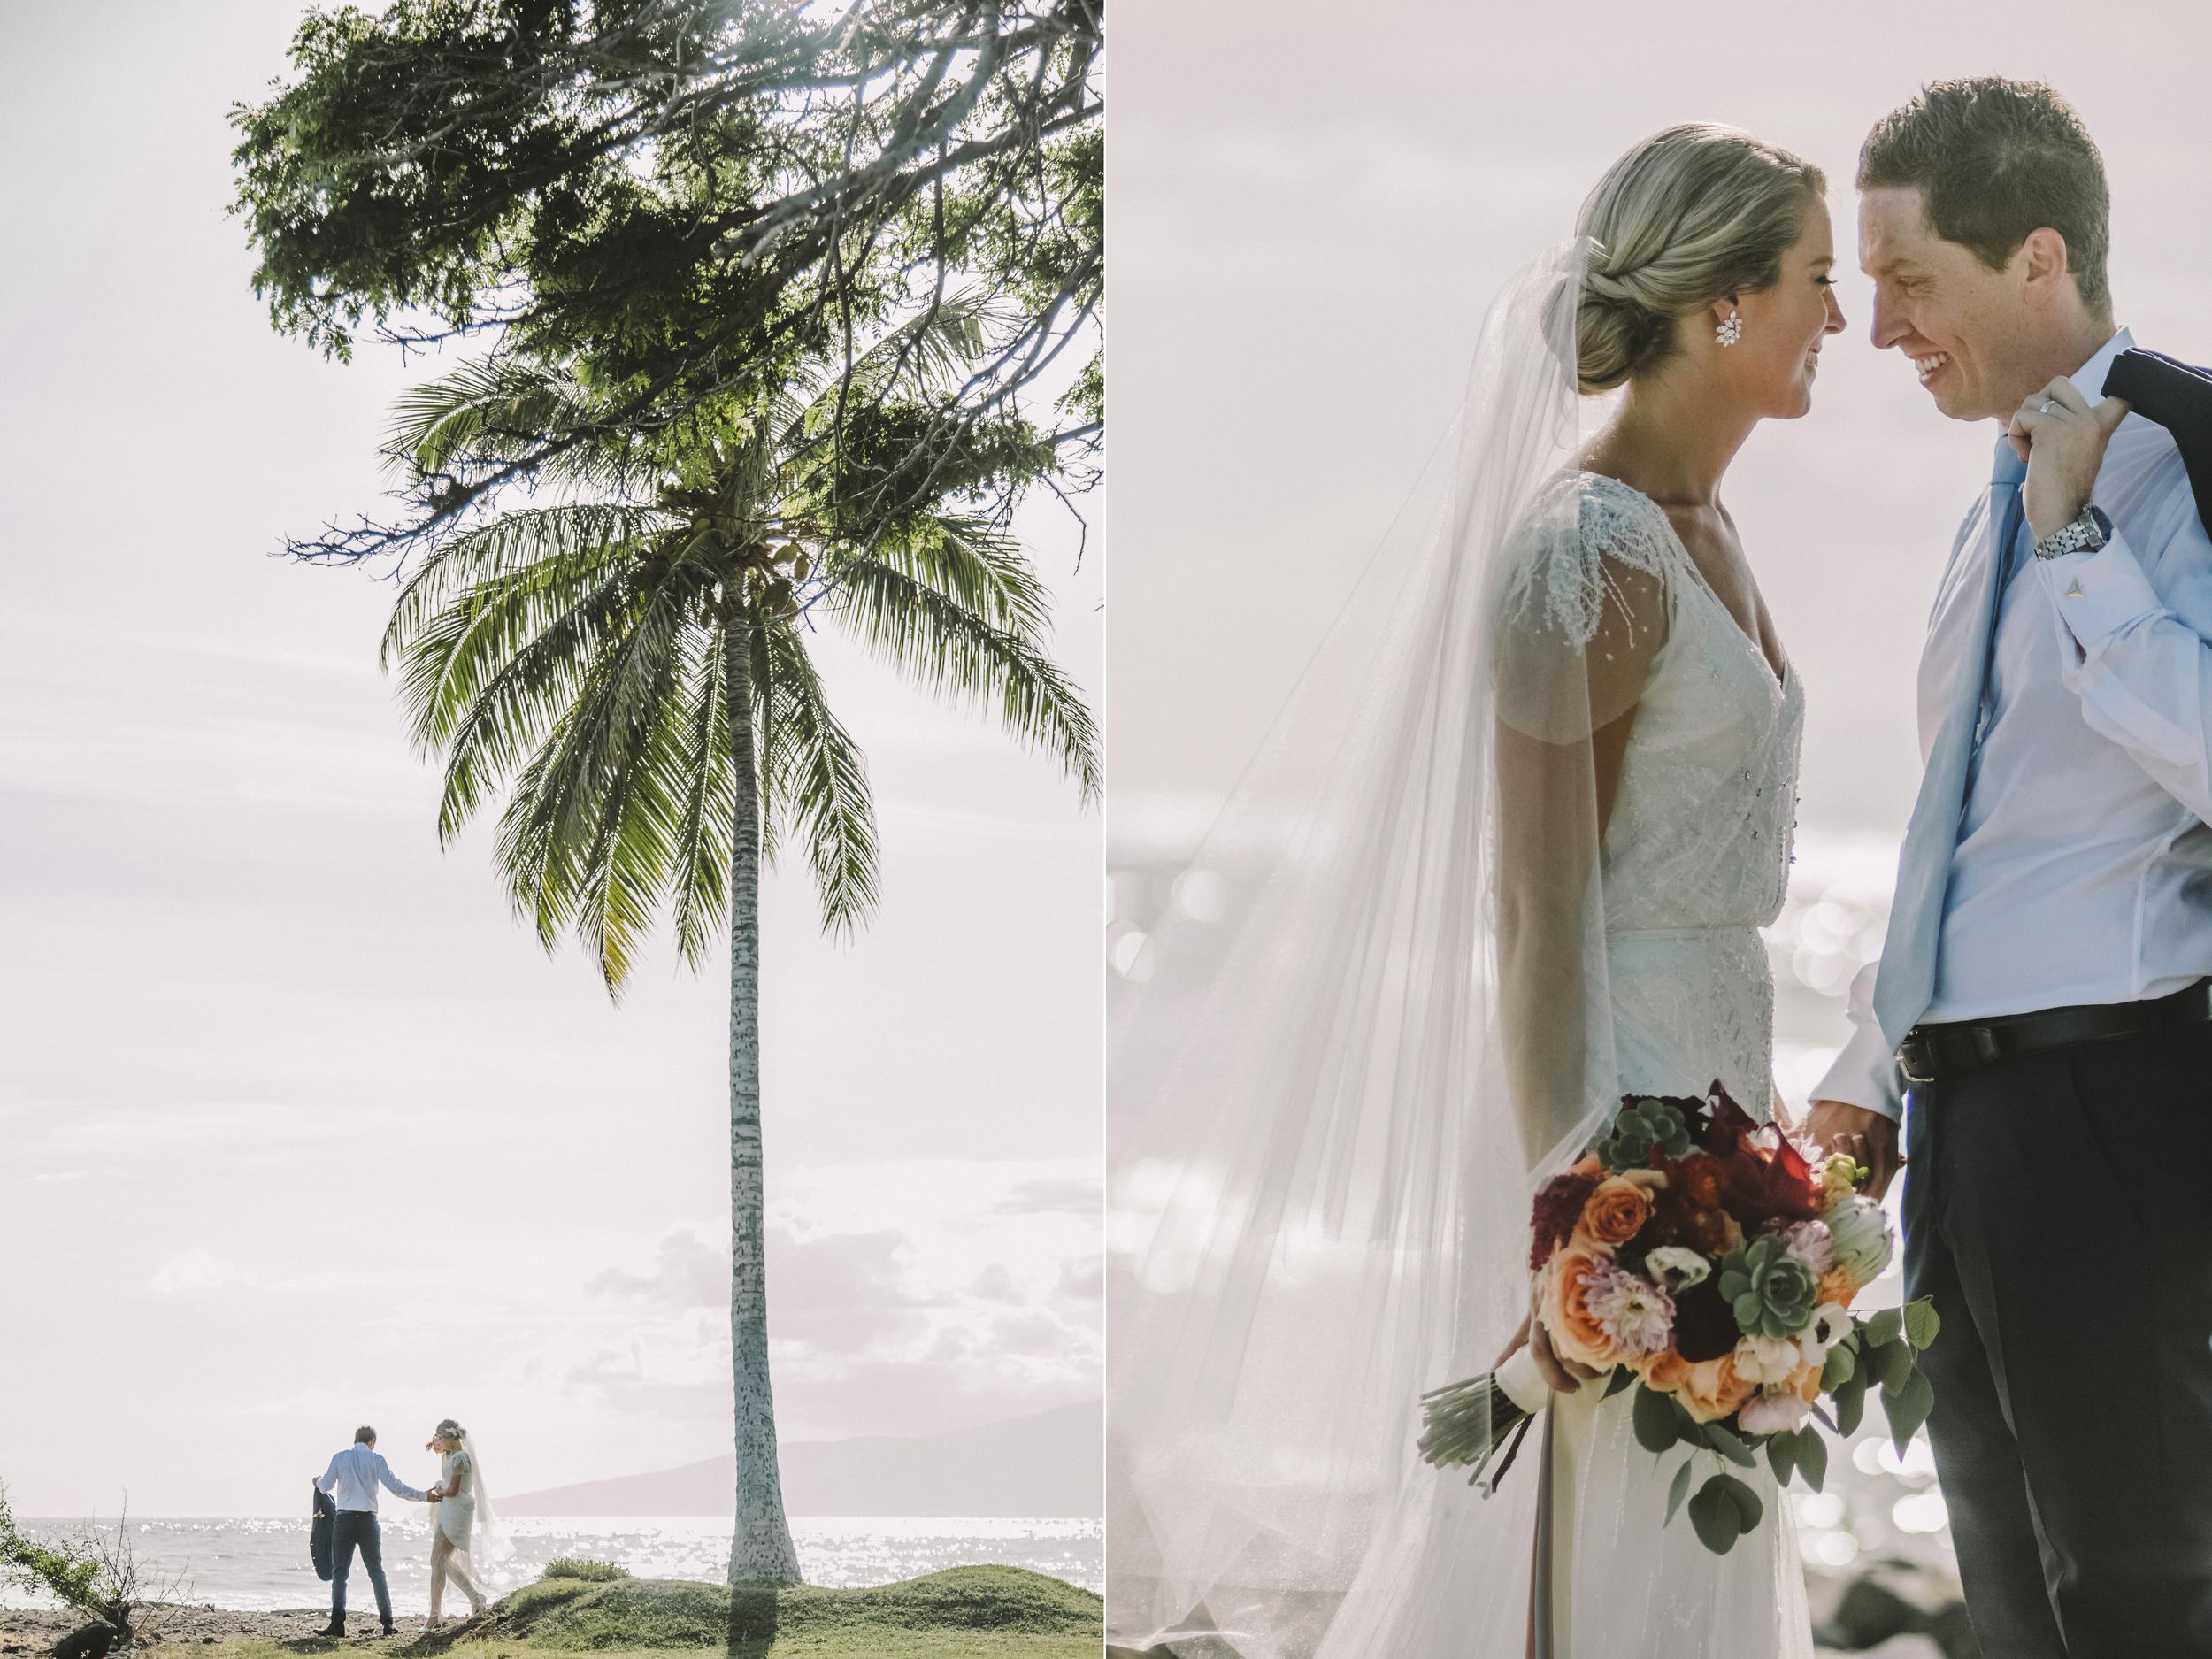 angie-diaz-photography-maui-wedding-mel-matt-75.jpeg